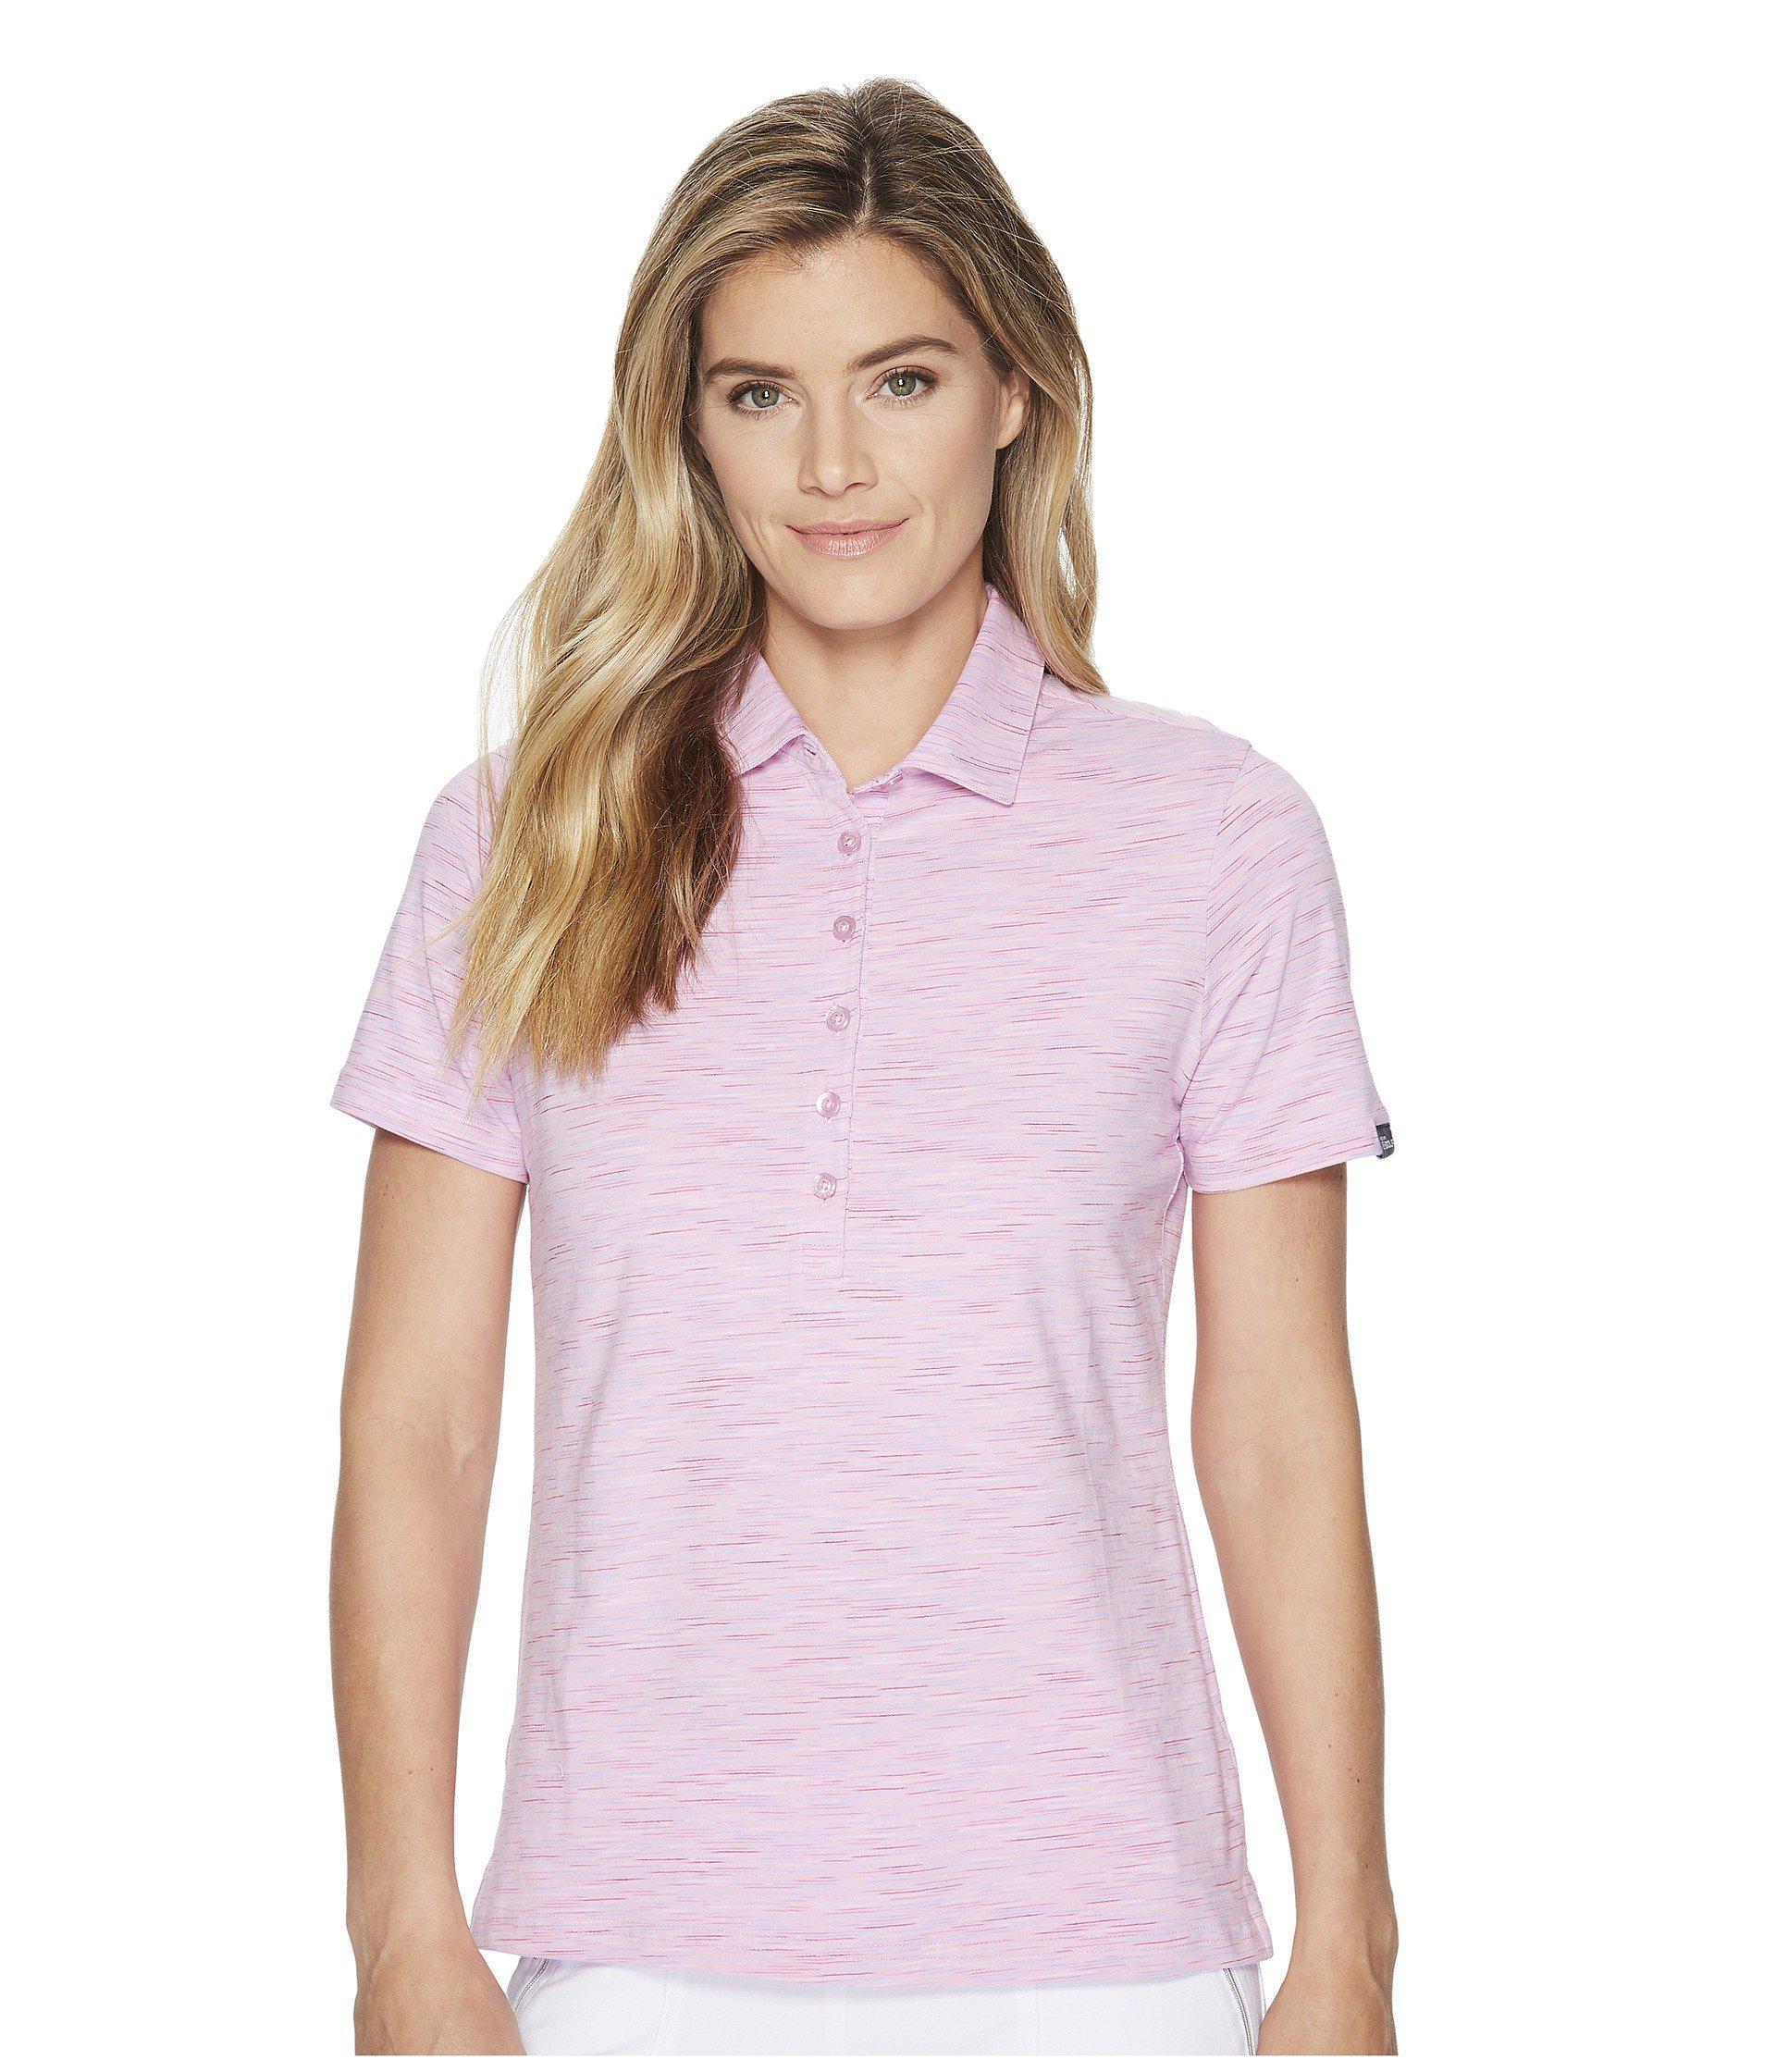 d2e67740e14df Izod Womens Sleeveless Polo Shirts – Rockwall Auction